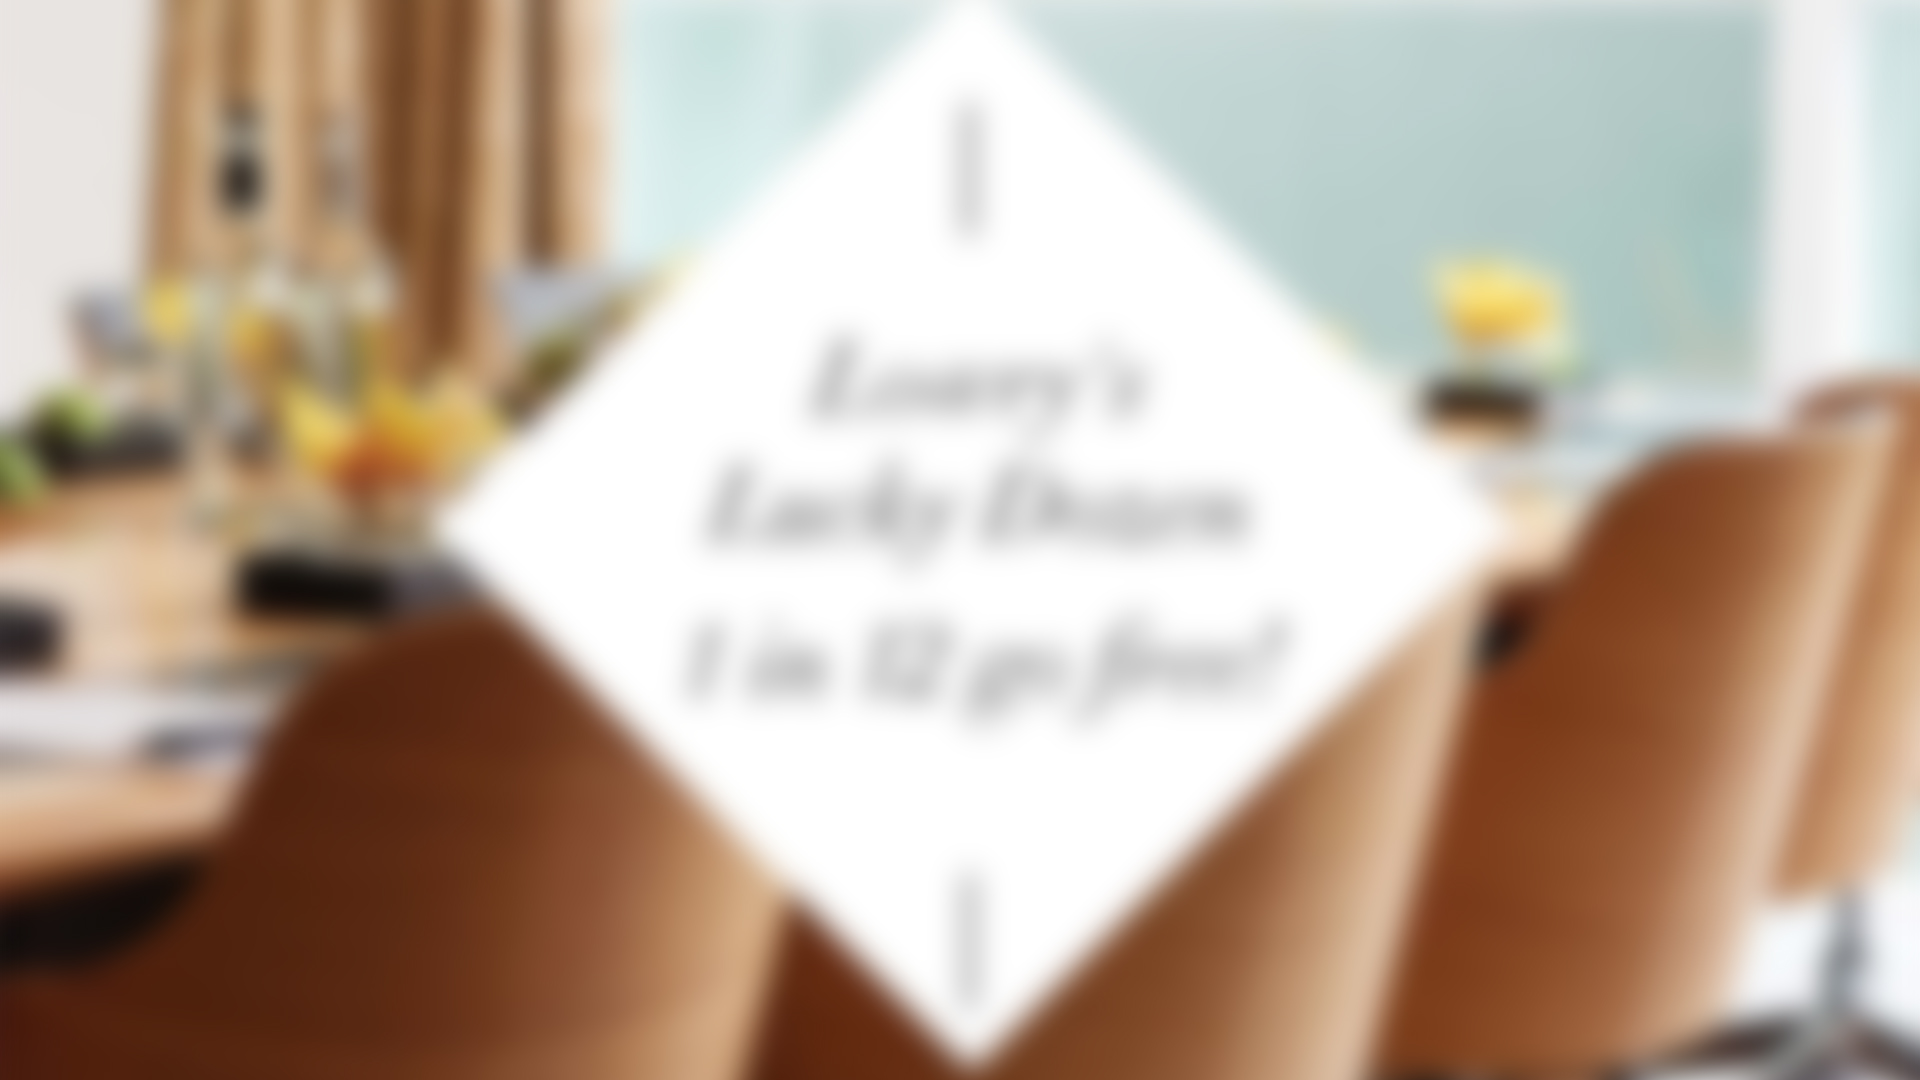 Lowry's Lucky Dozen: 1 in 12 go free!